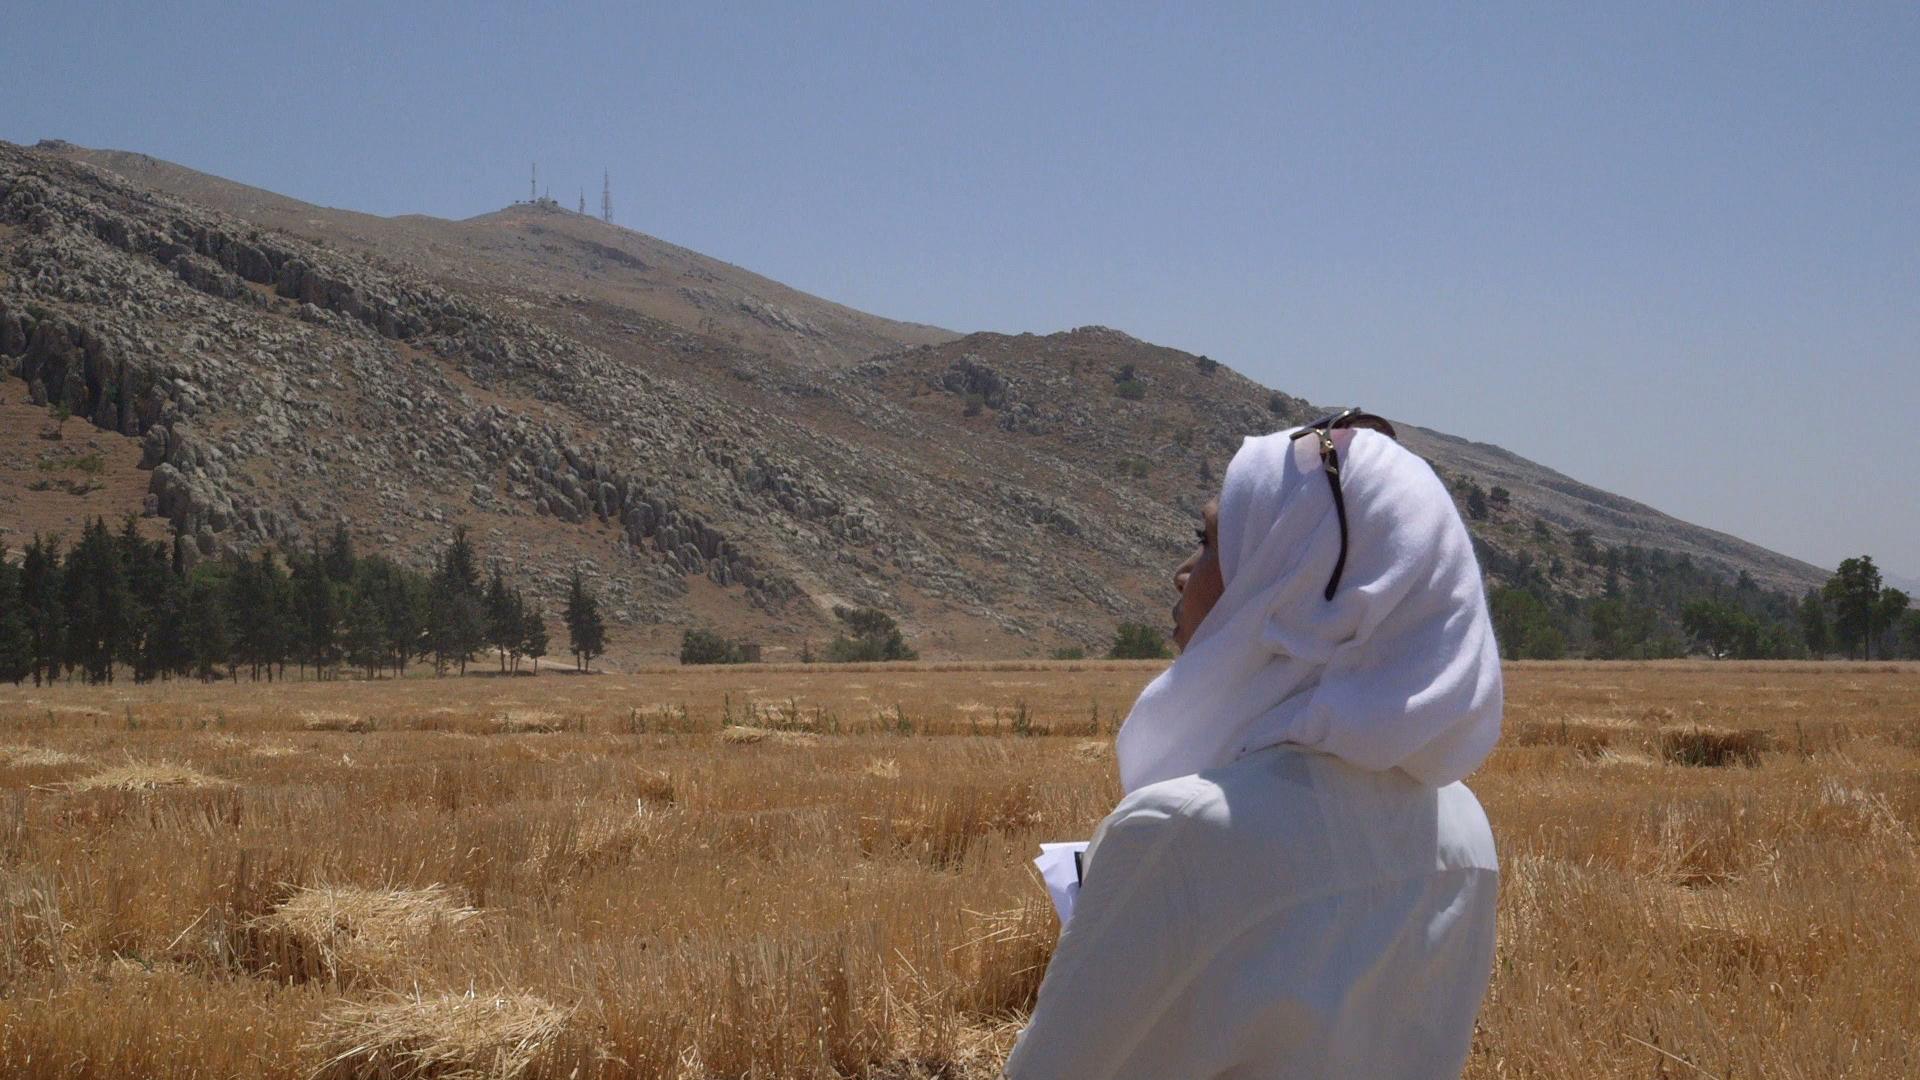 Saja Al Zoubi